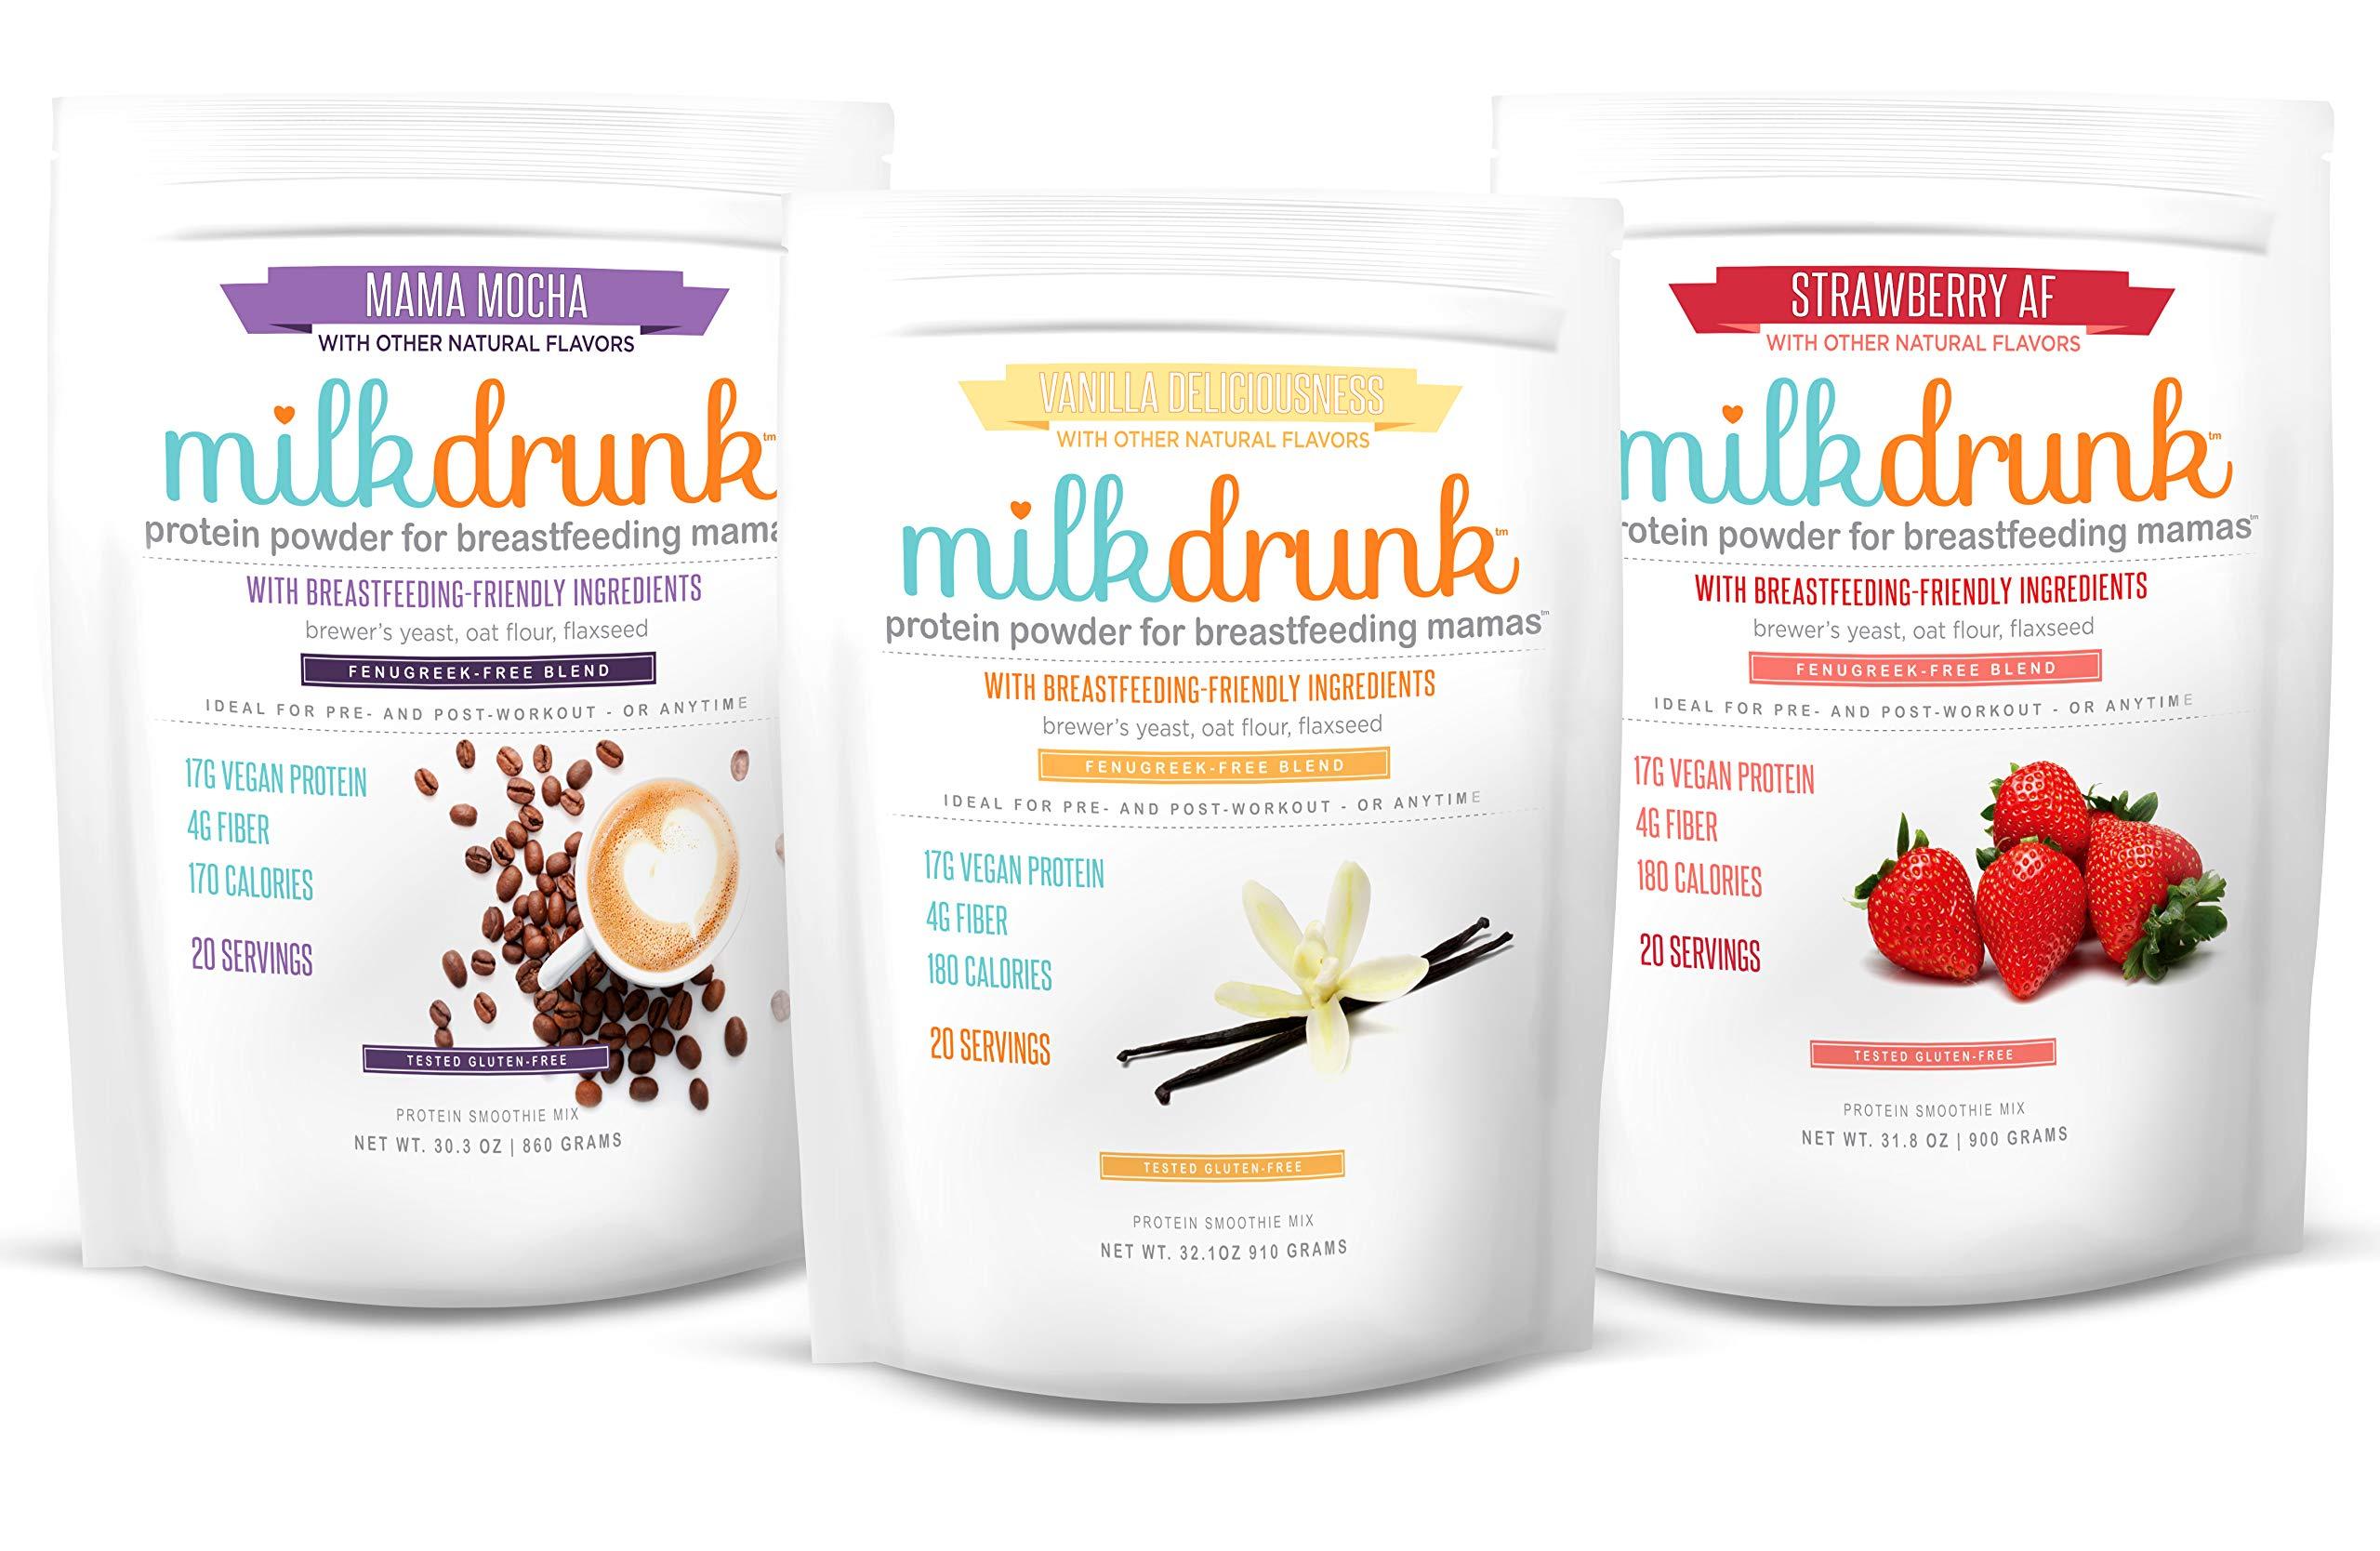 3 Bag Fenugreek-Free Variety Pack - Milk Drunk Protein Powder for Breastfeeding - 60 Servings Vegan Protein, Lactation-Boosting 17g Protein 4g Fiber 6g Sugar - Oat Flour, Flax, Brewer's Yeast by Milk Drunk (Image #1)